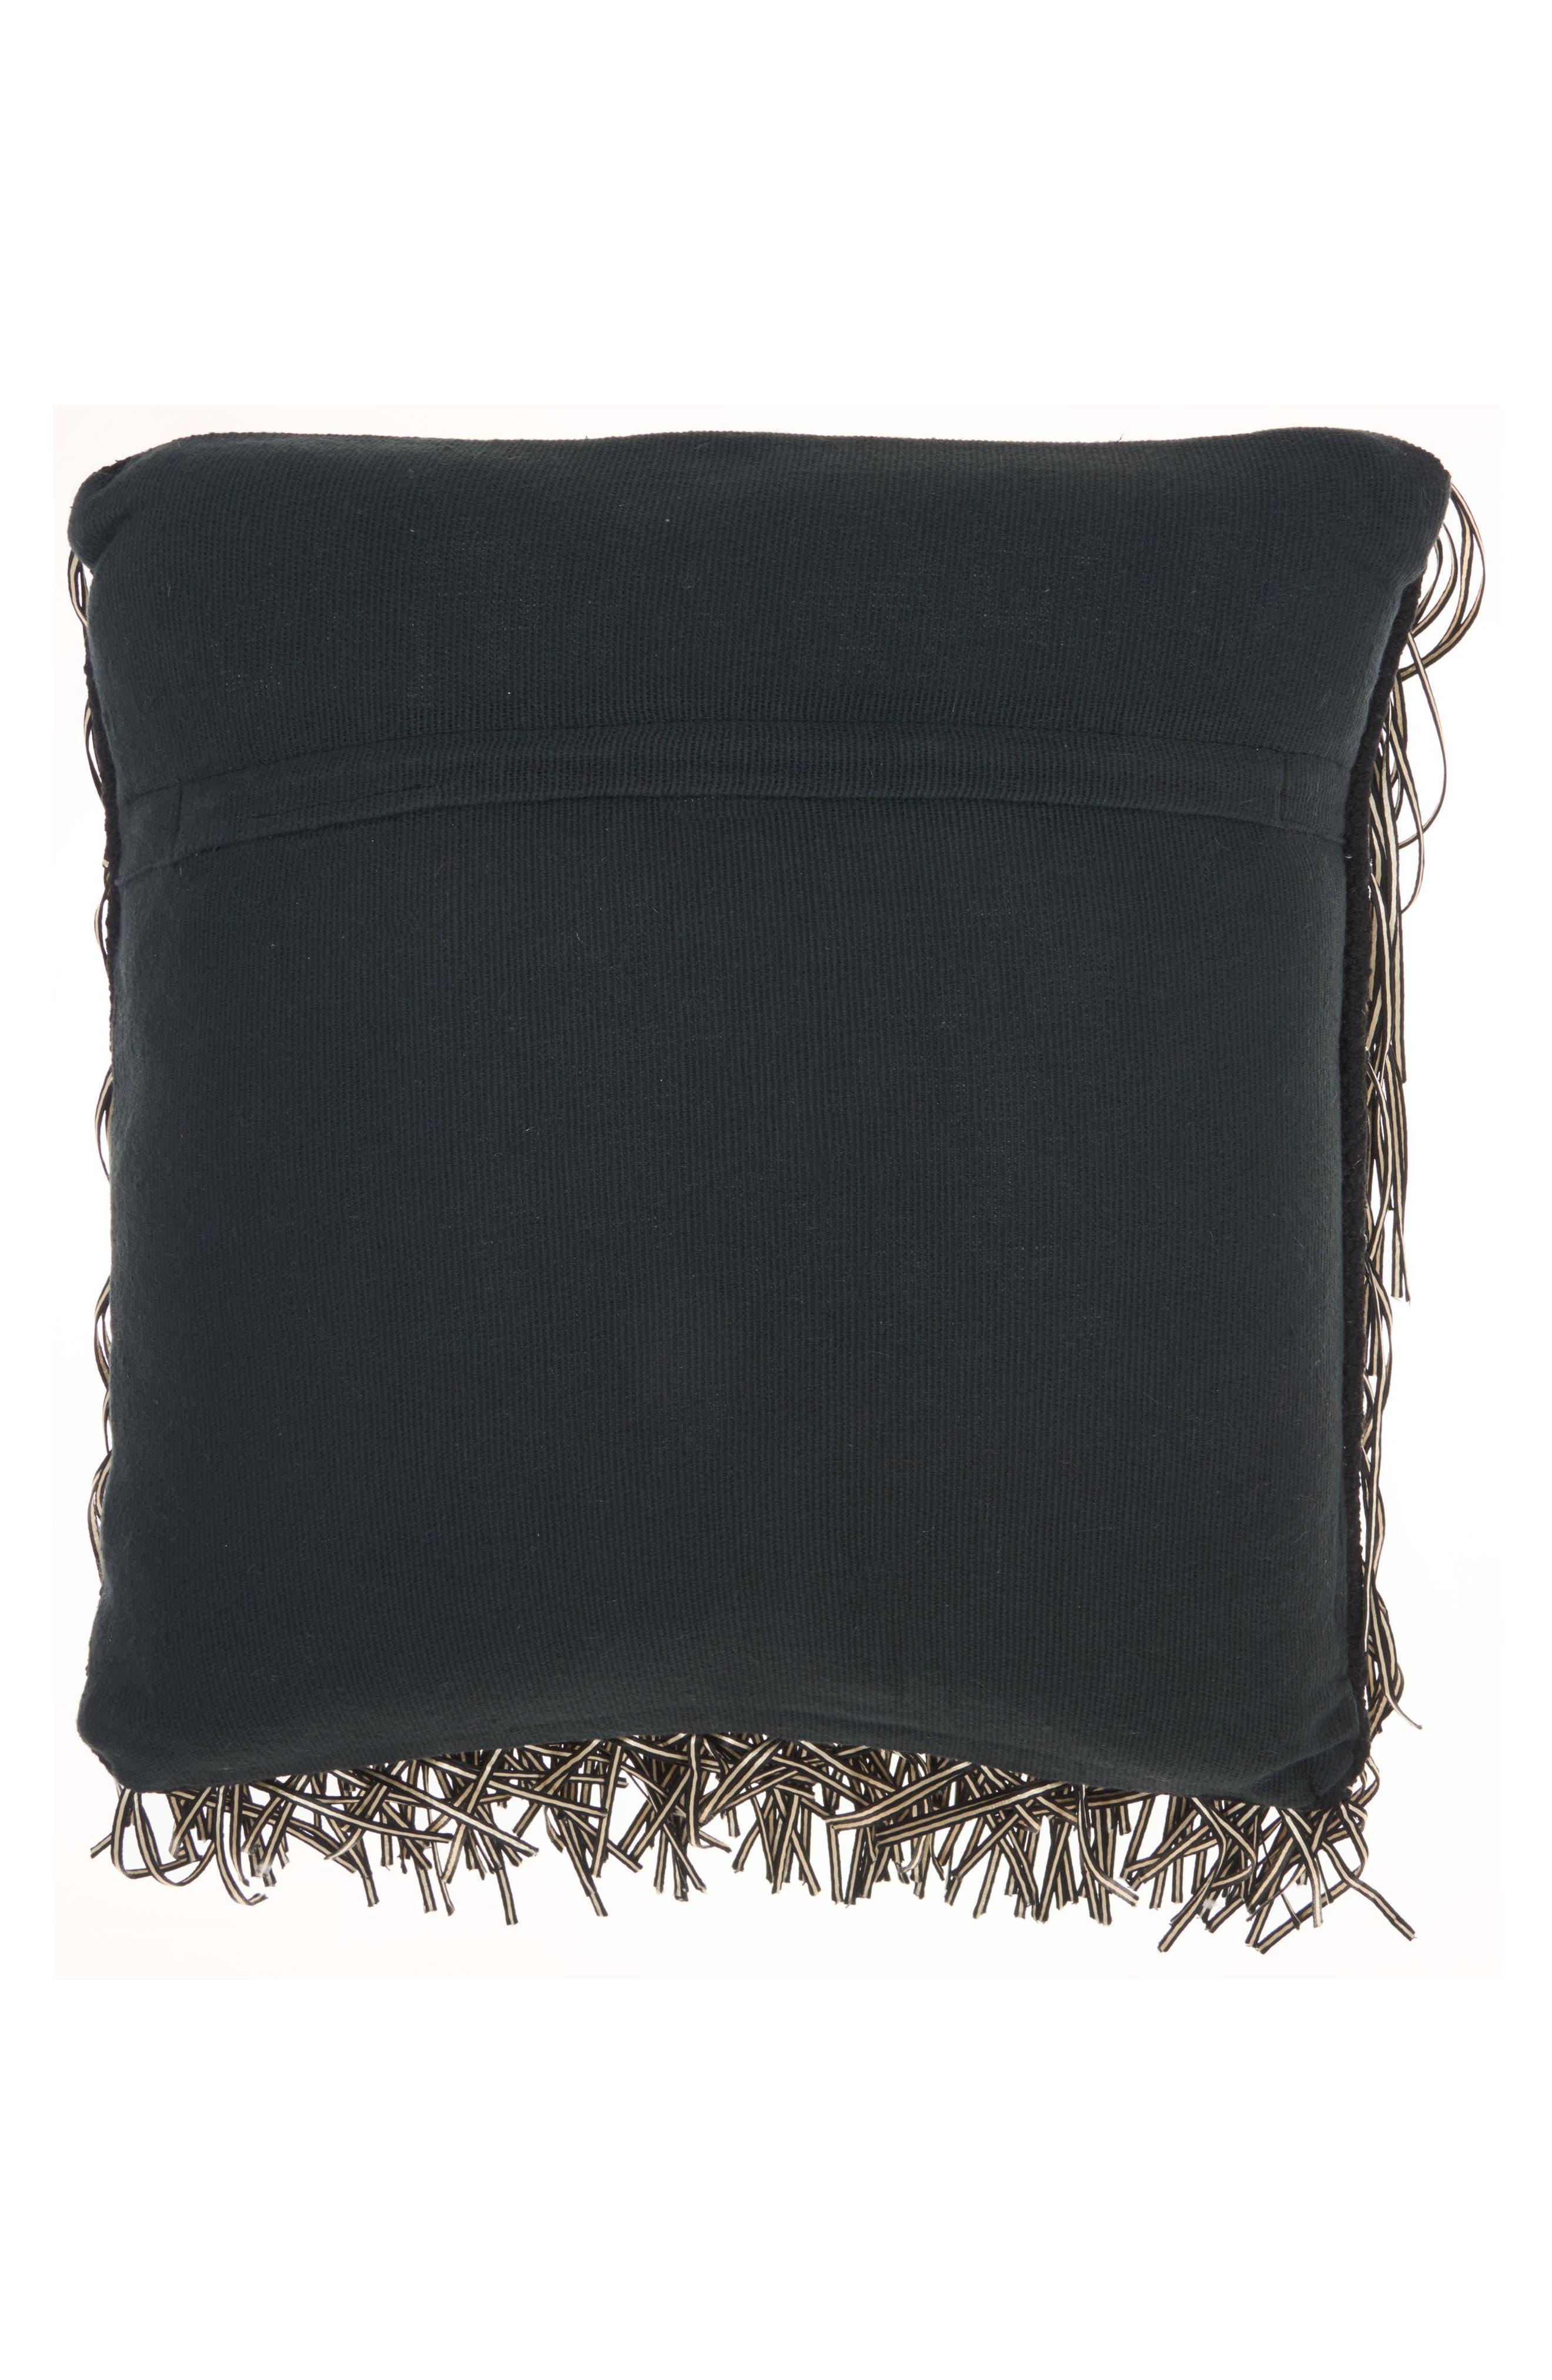 Metallic Fringe Pillow,                             Alternate thumbnail 2, color,                             Black